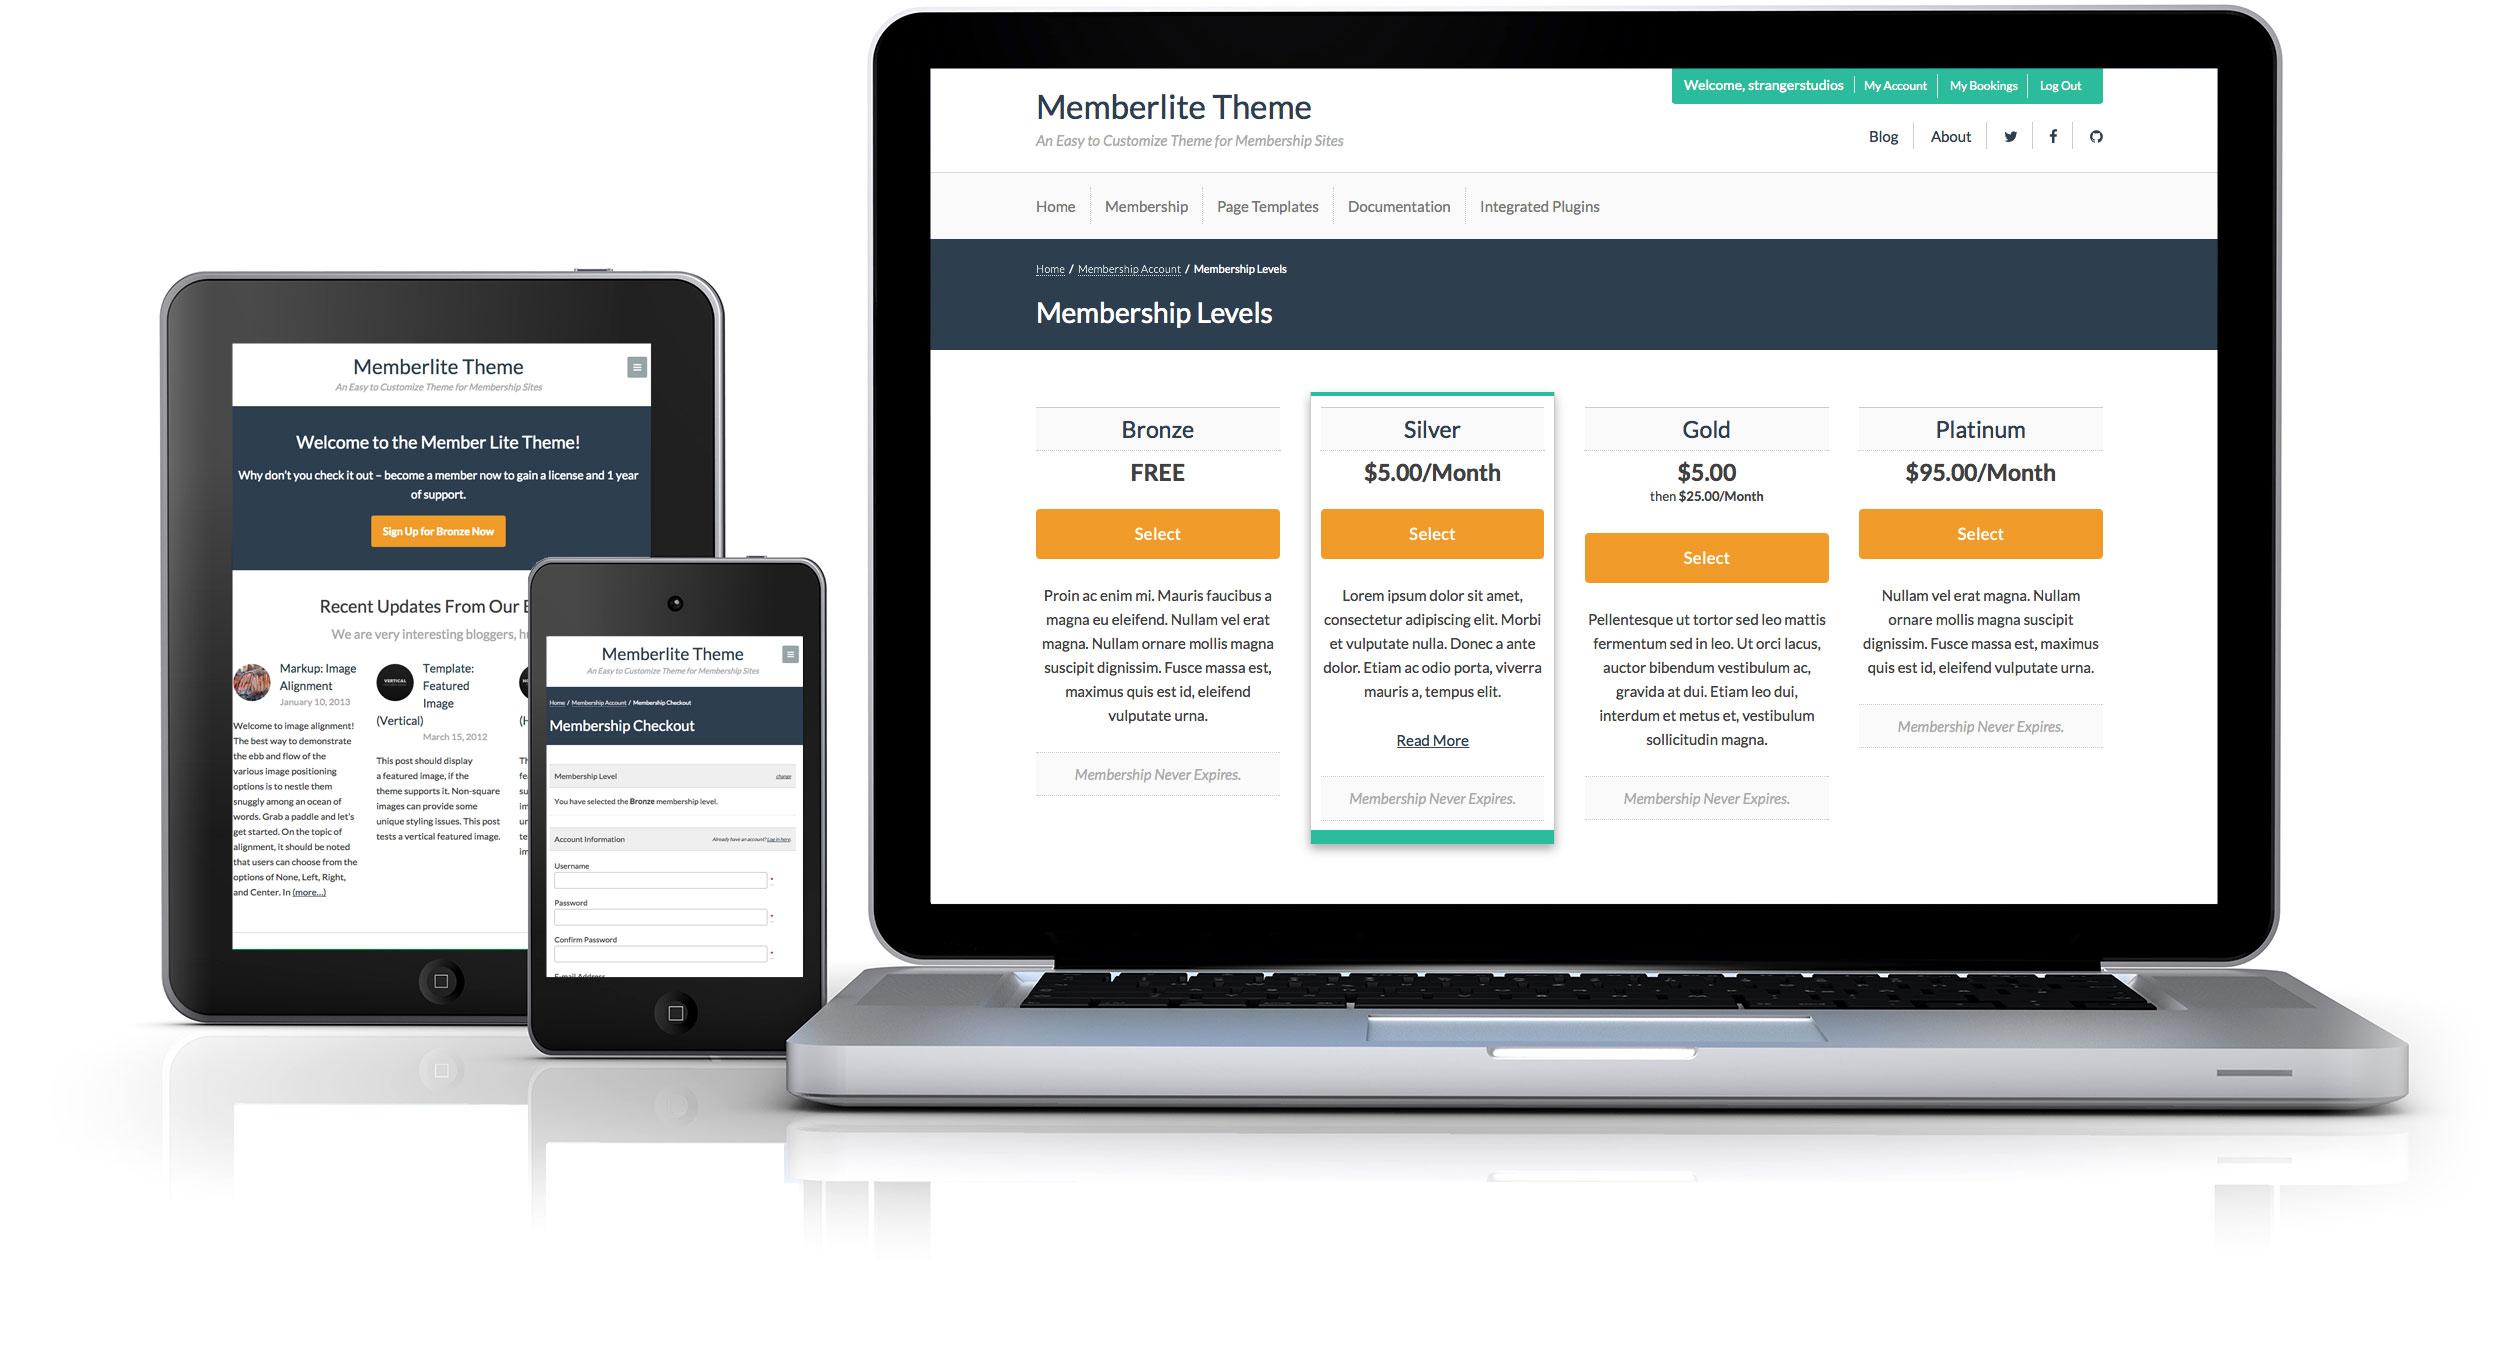 Memberlite Theme Screenshots on Desktop and Mobile